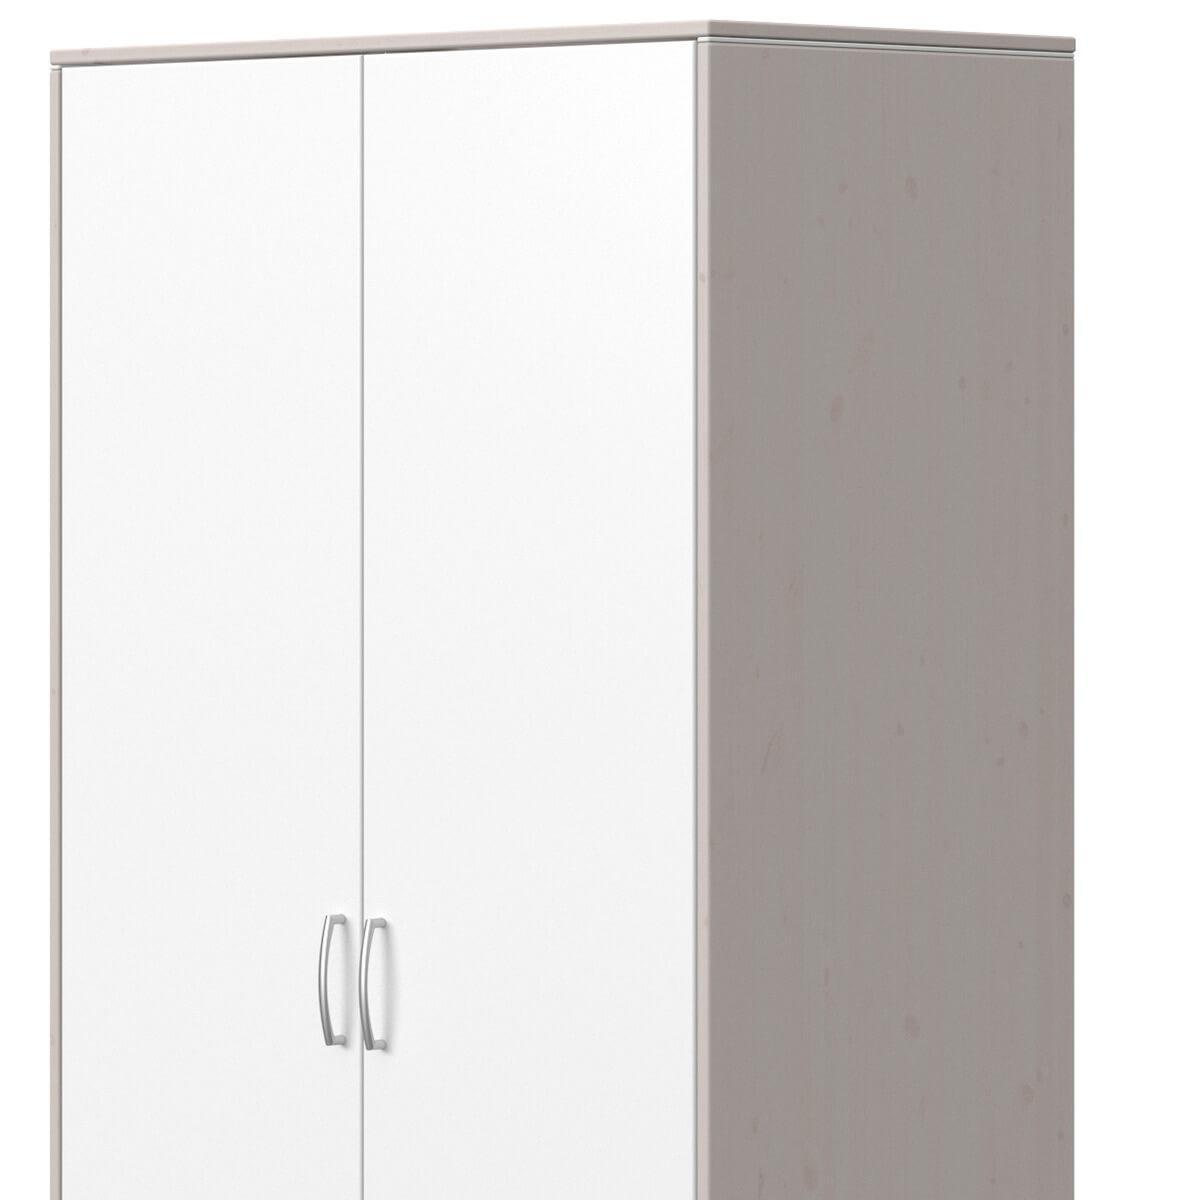 Armoire 2 portes 2 tiroirs CLASSIC Flexa blanc-grey washed